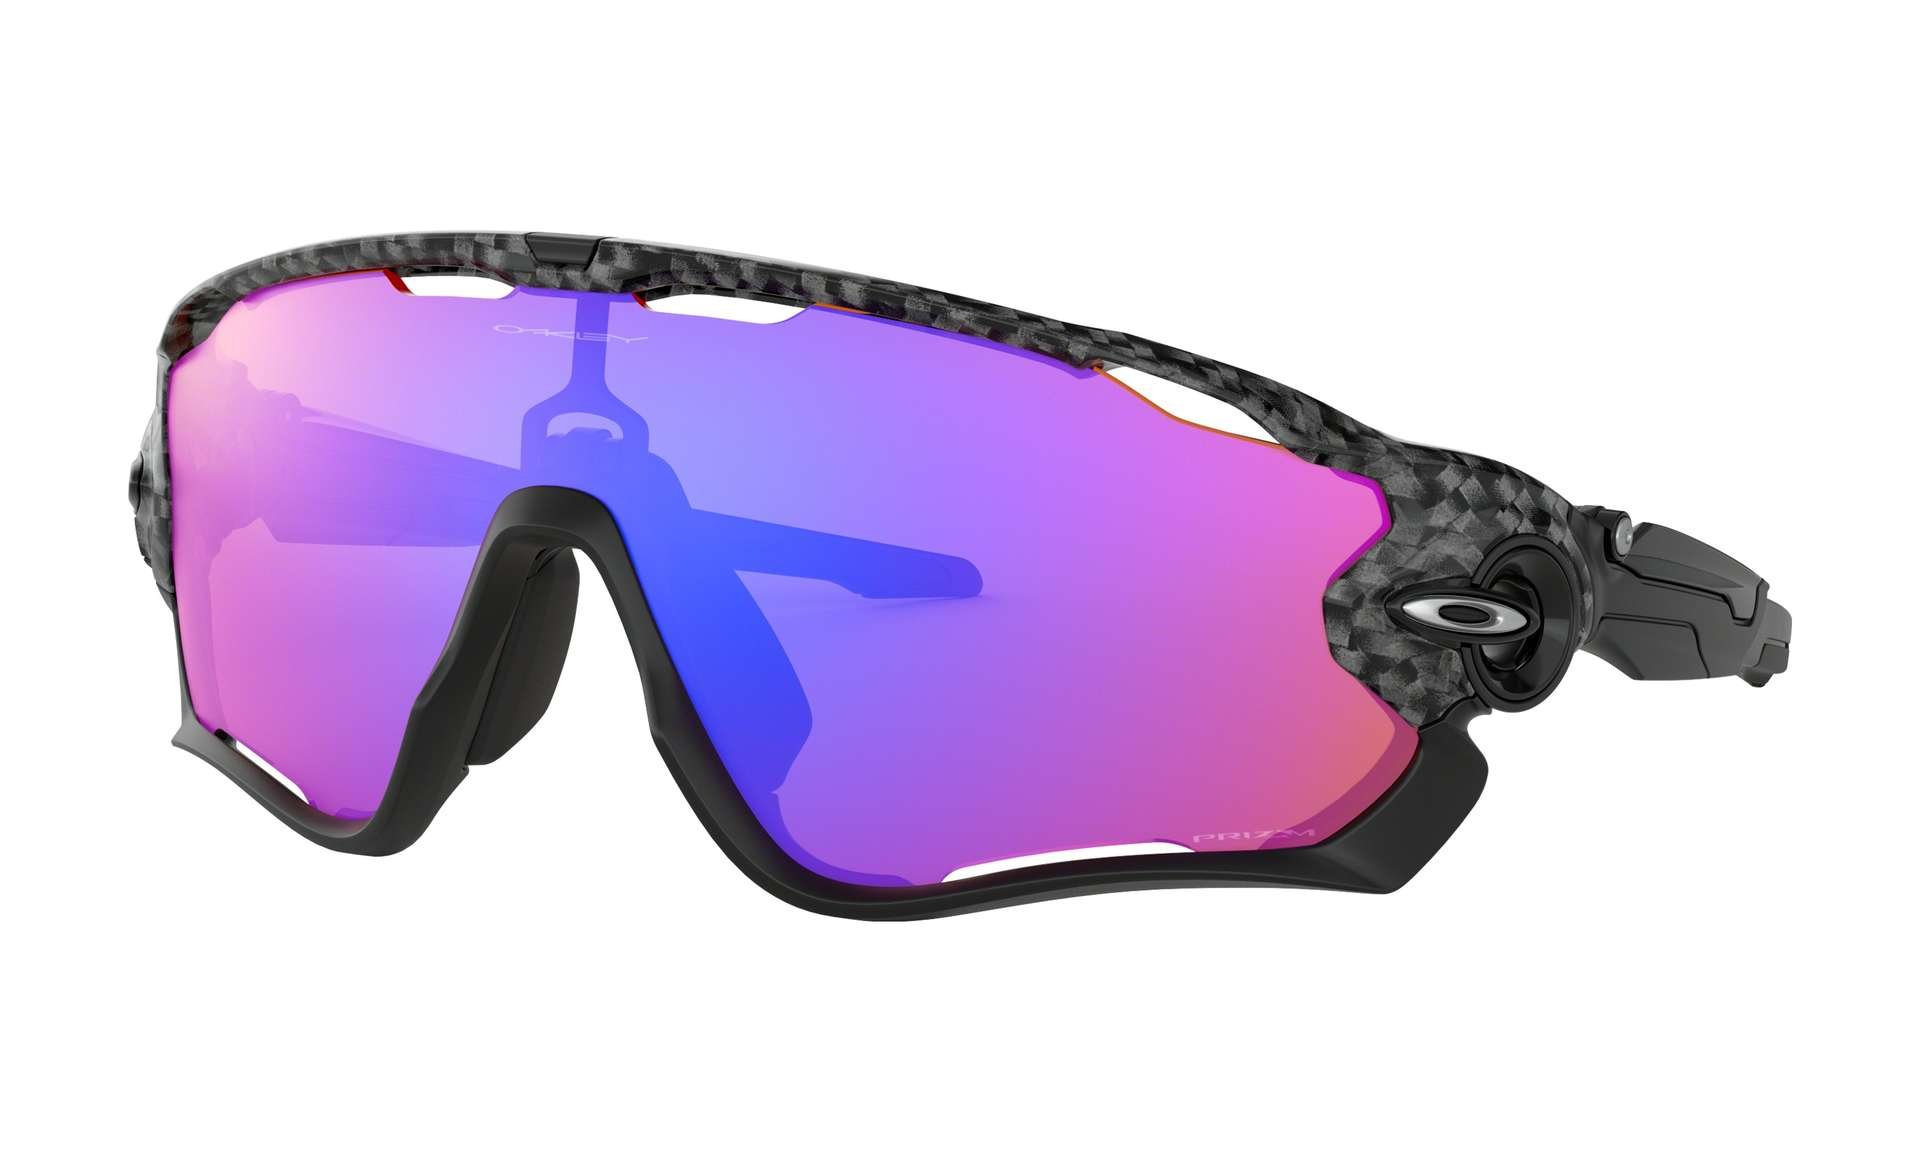 Oakley Jawbreaker Sport Zonnebril Carbon Fiber Prizm Trail Lens Zwart Koop Je Bij Futurumshop Nl